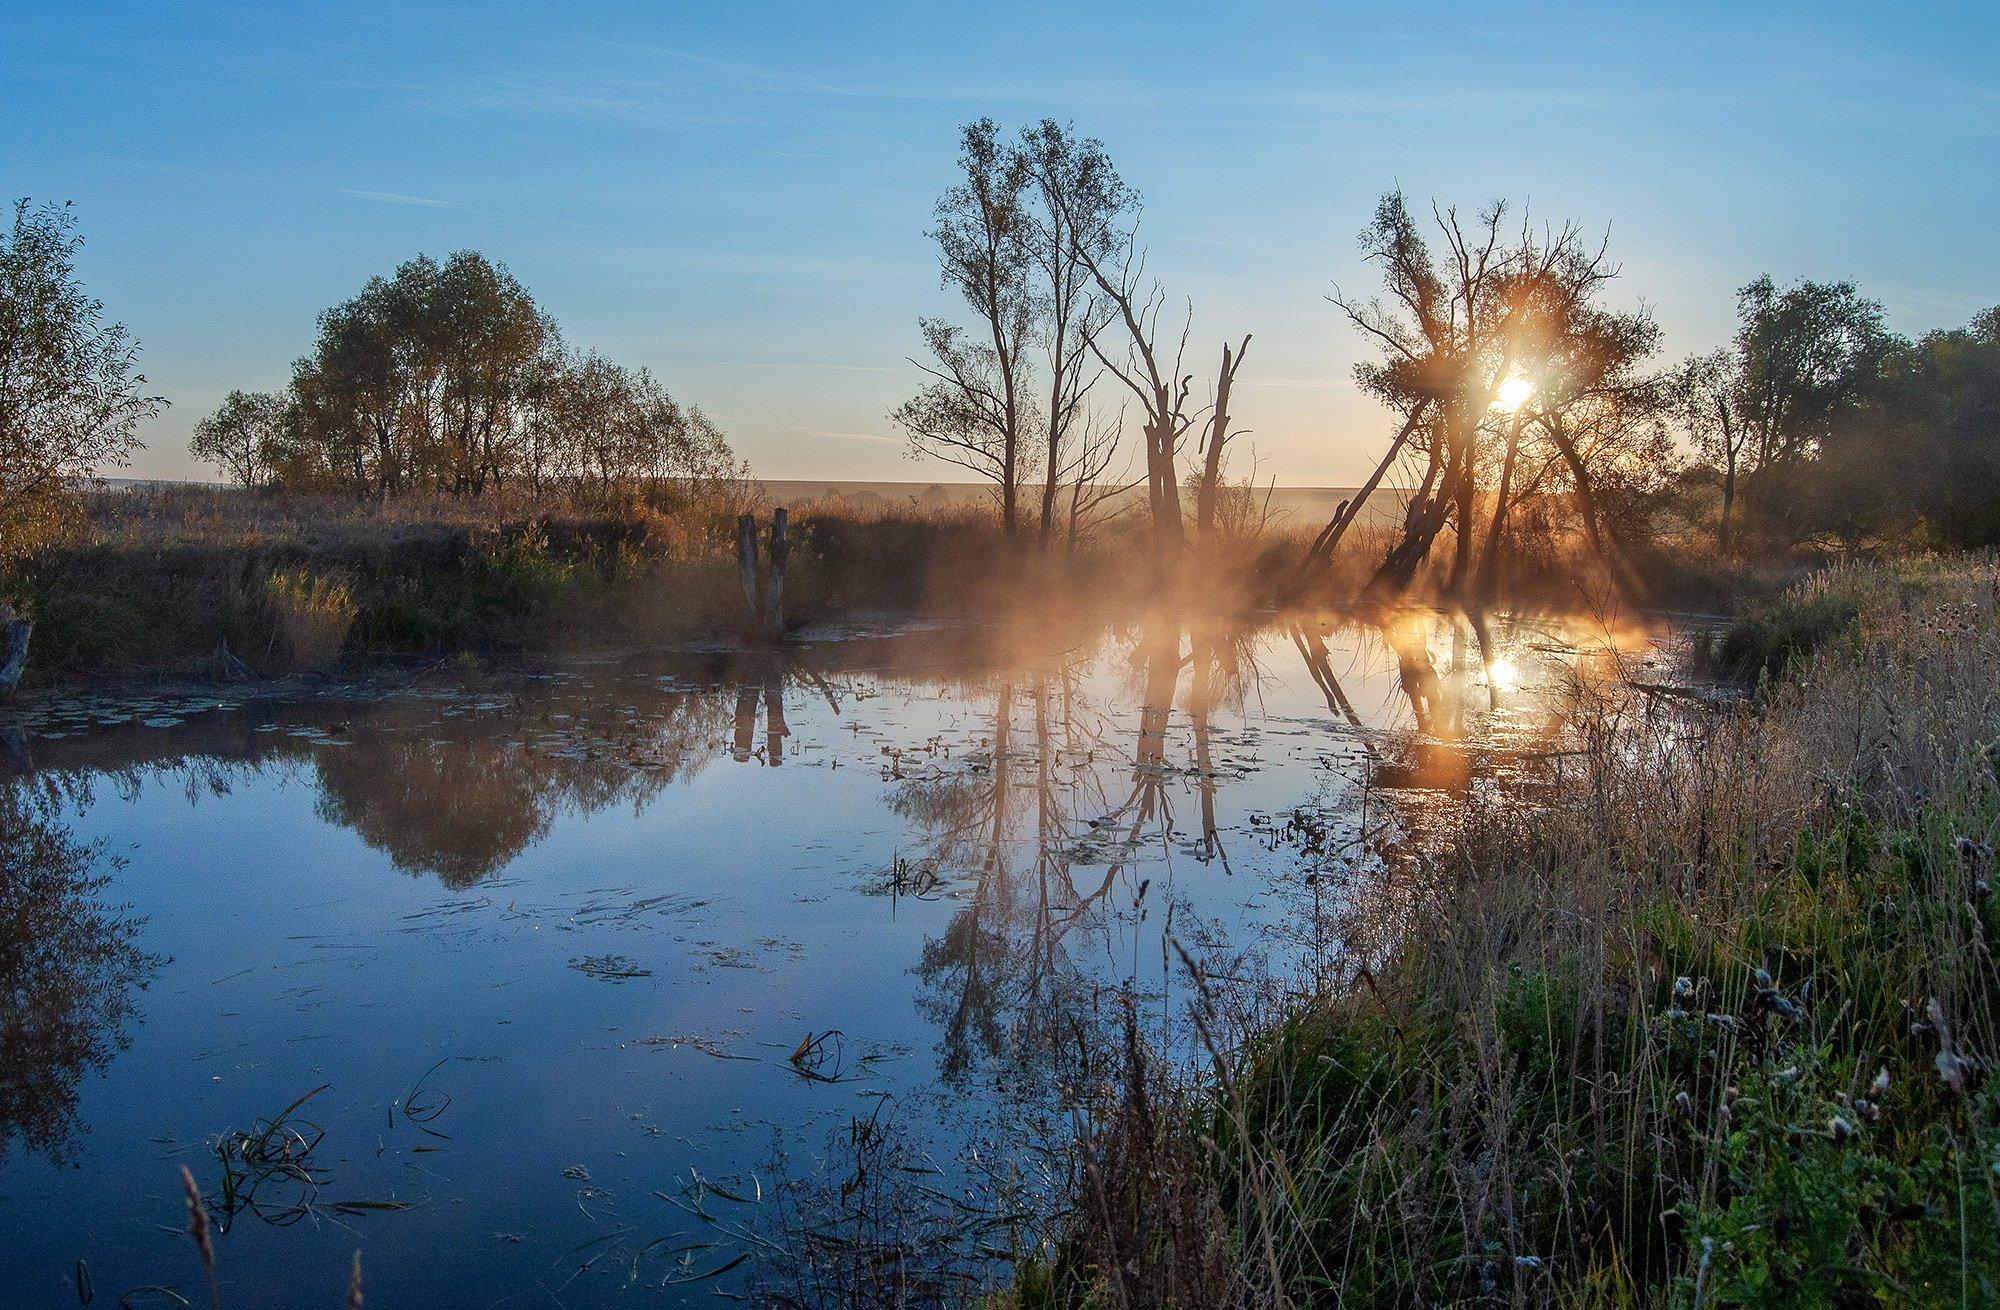 утро, рассвет, лето, солнце, осень, туман, река, дерево, Andres Ganenkoff